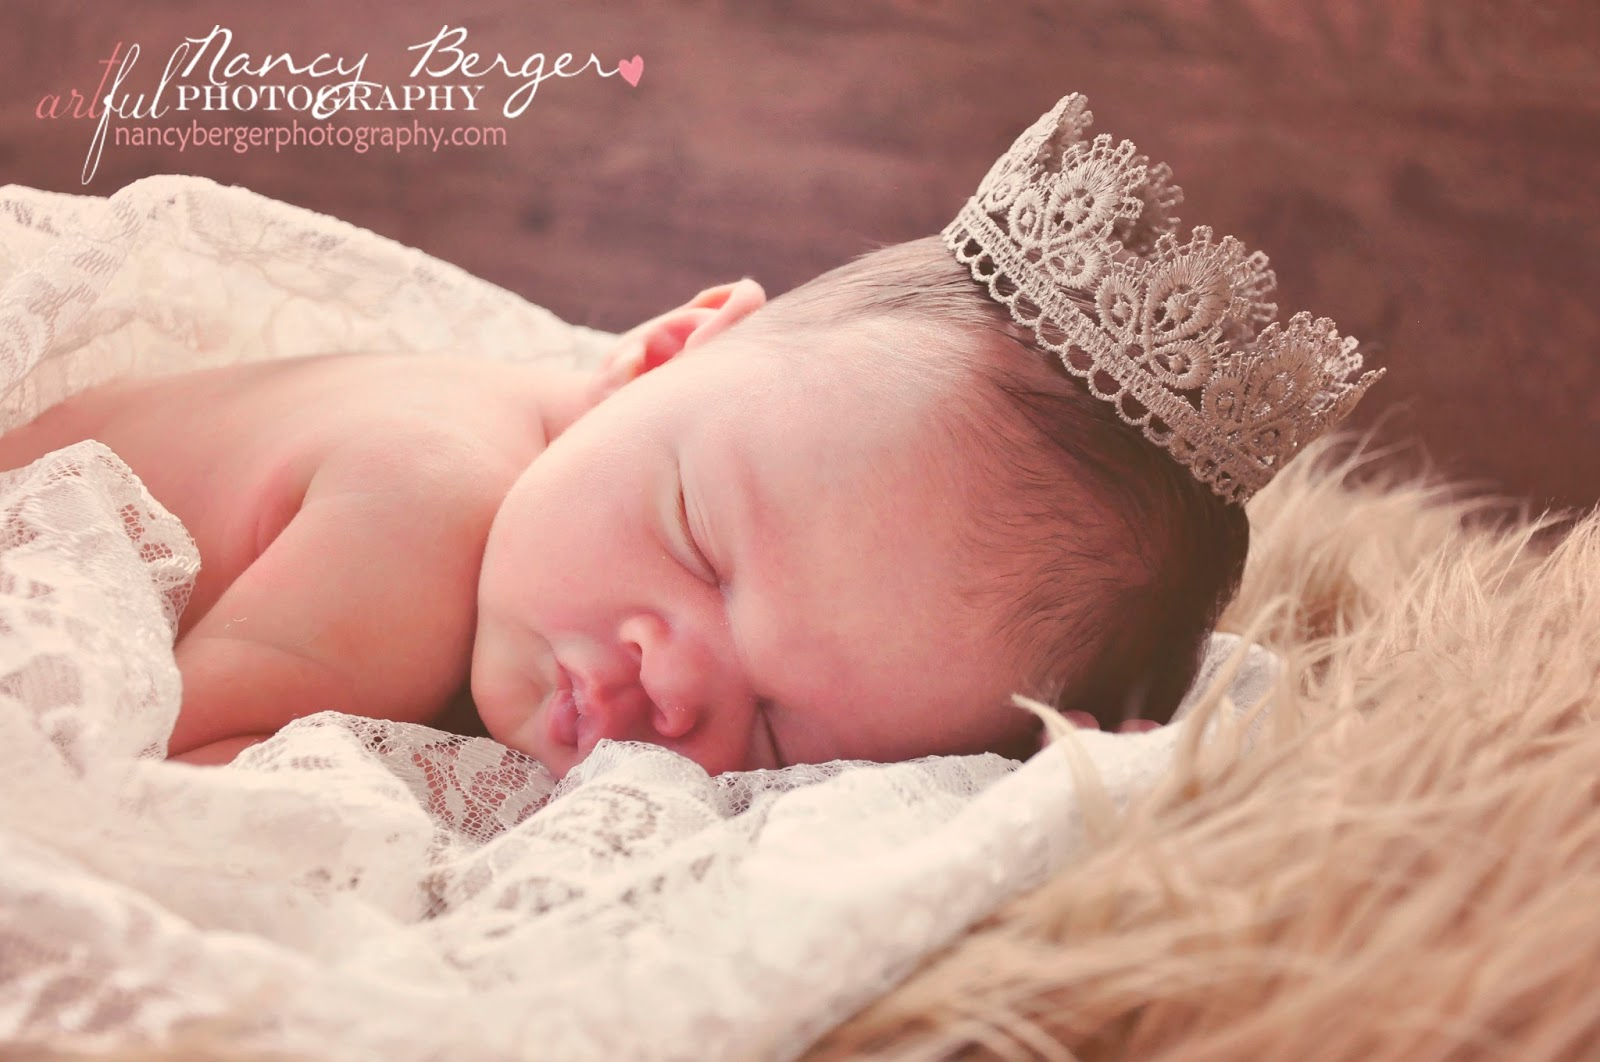 nancybergerartfulblog: Meet My Sweet Little Miss Scarlett